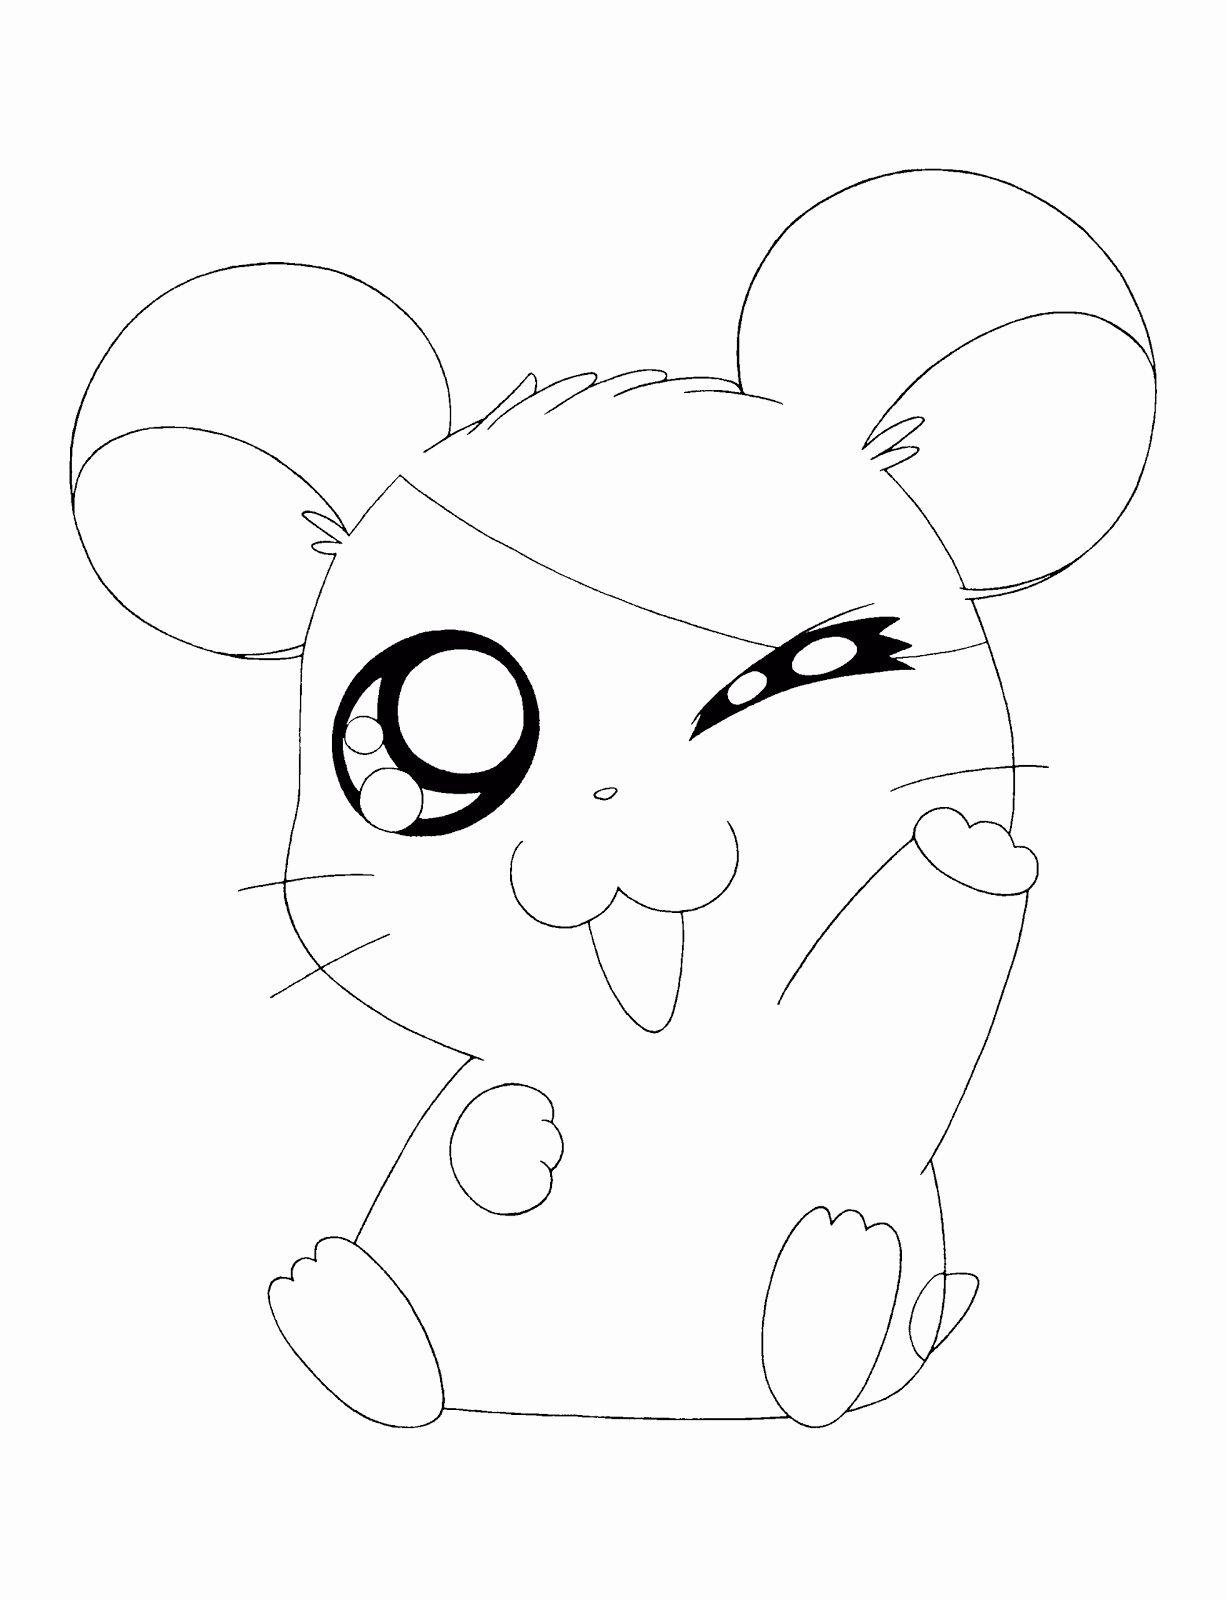 Cute Animal Coloring Page New Hamtaro Cute Animals Coloring Pages In 2020 Cute Coloring Pages Animal Coloring Books Dinosaur Coloring Pages